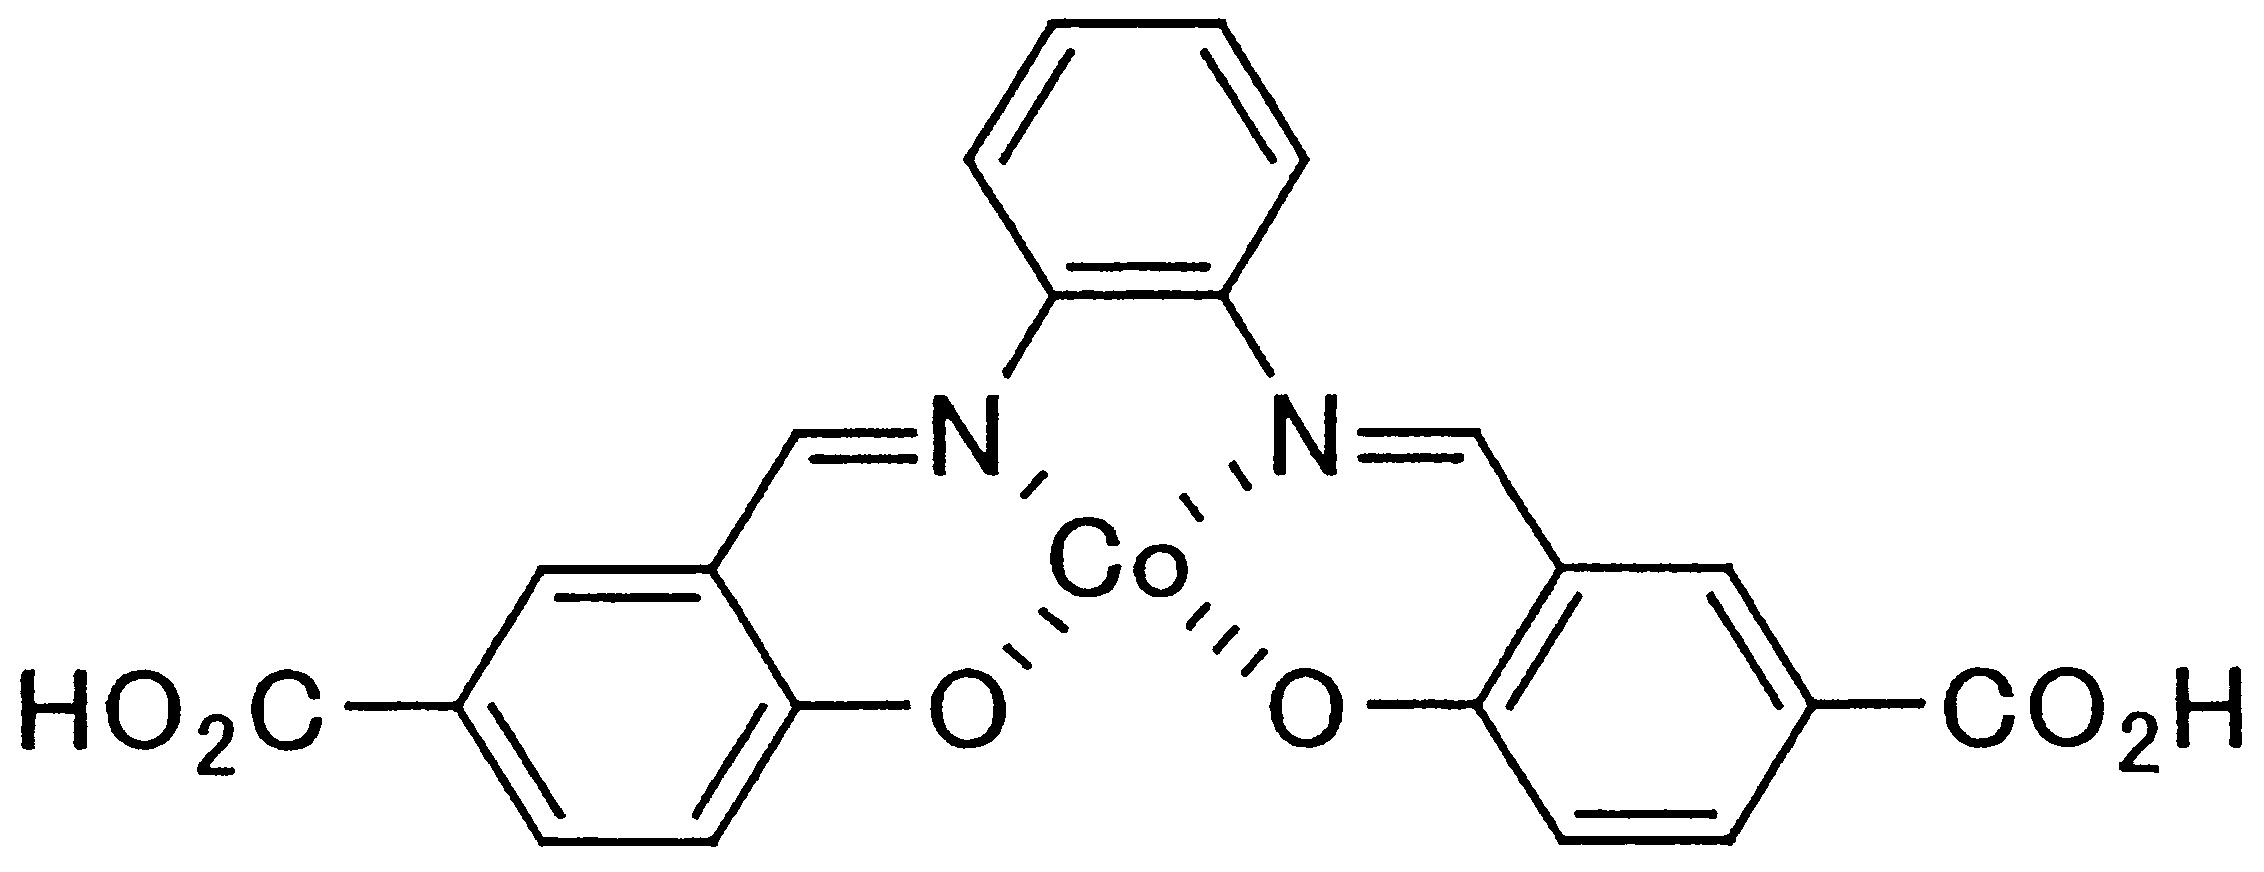 Figure 112003016236117-pat00023